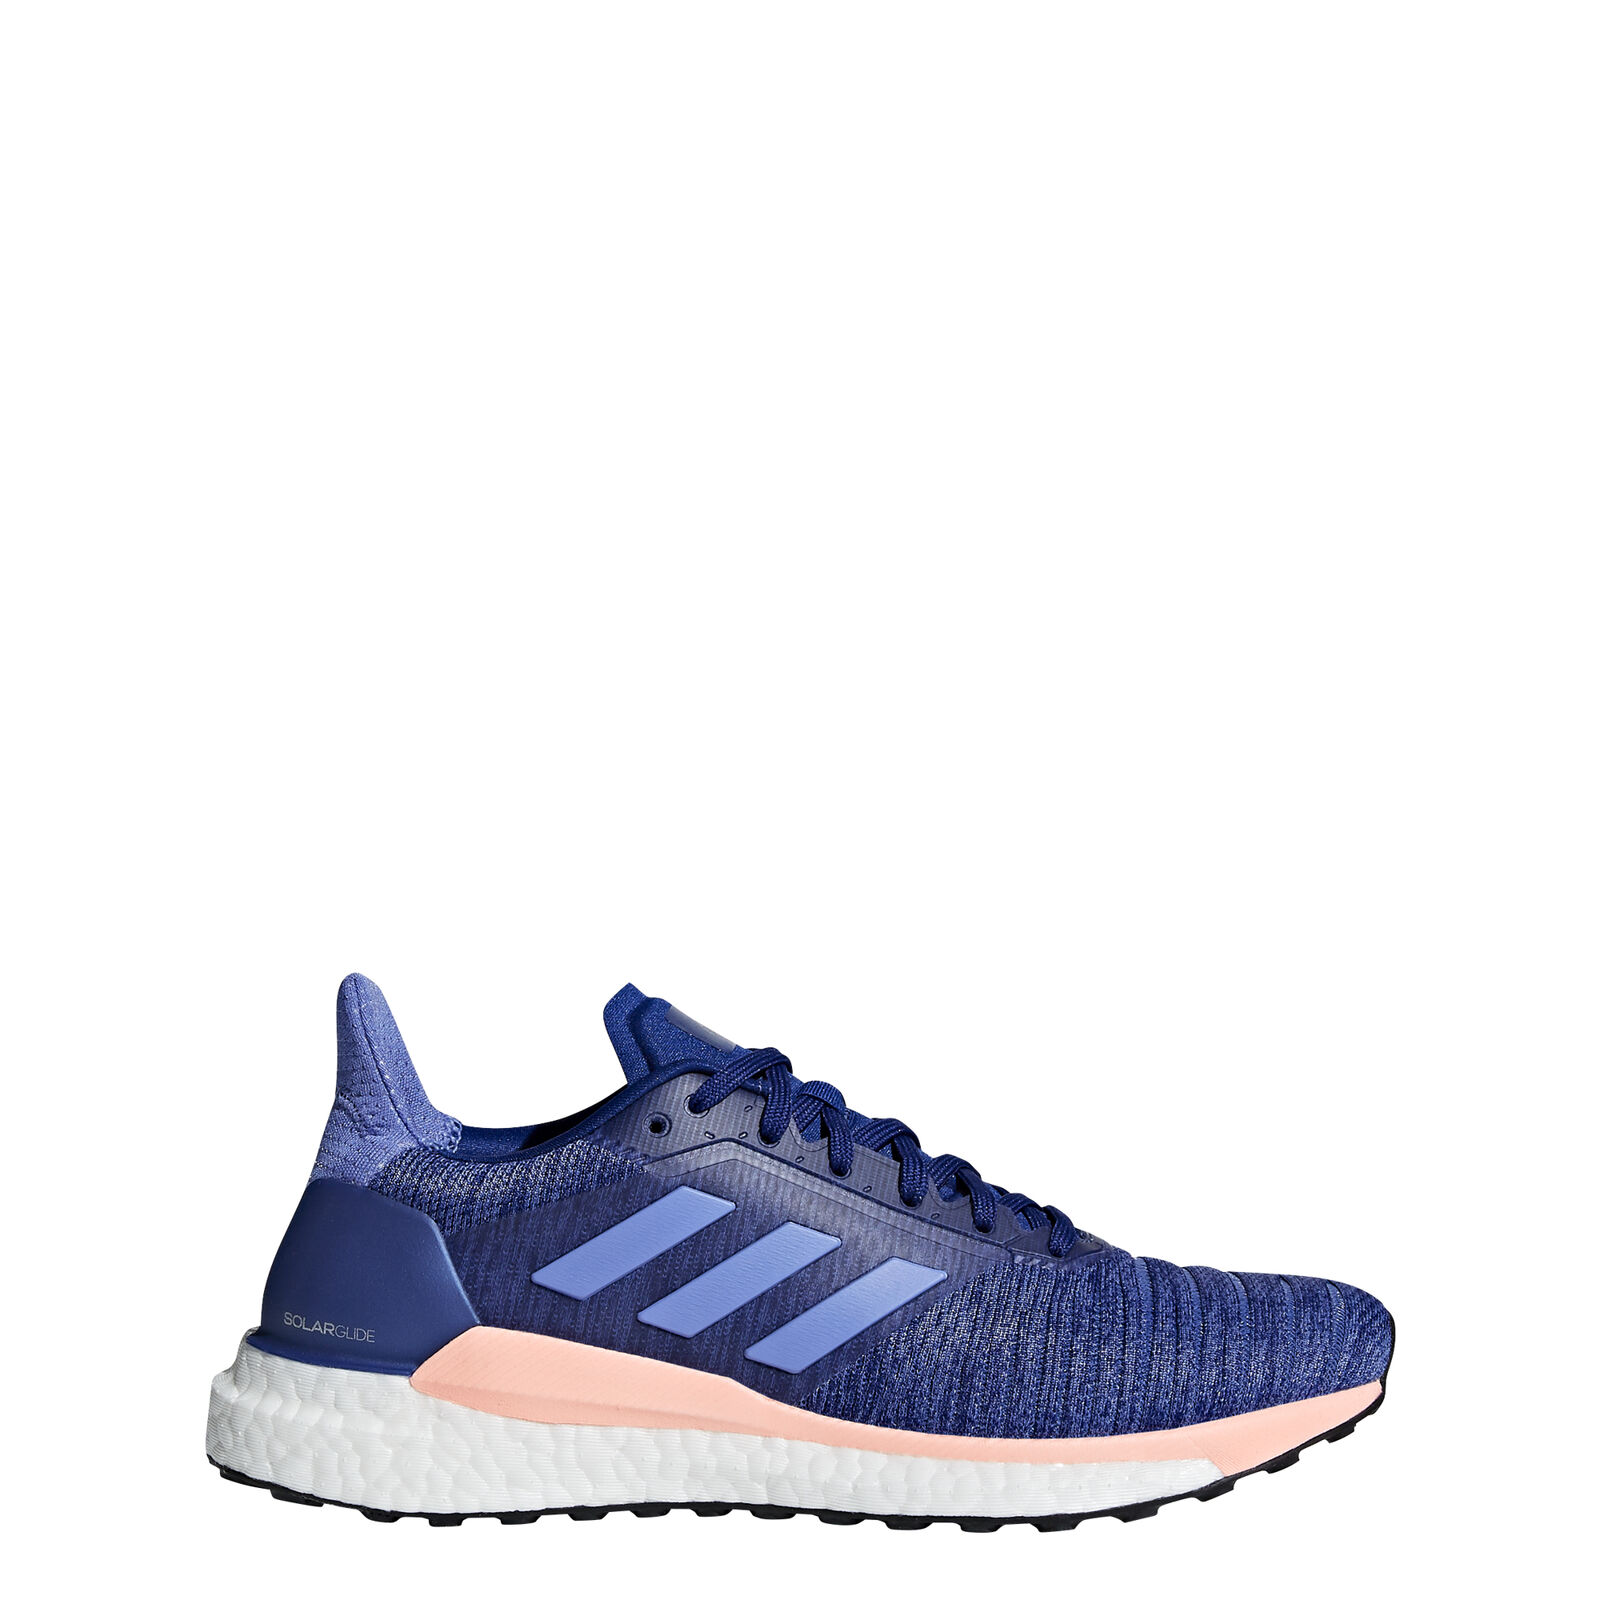 adidas schuh jogging braun